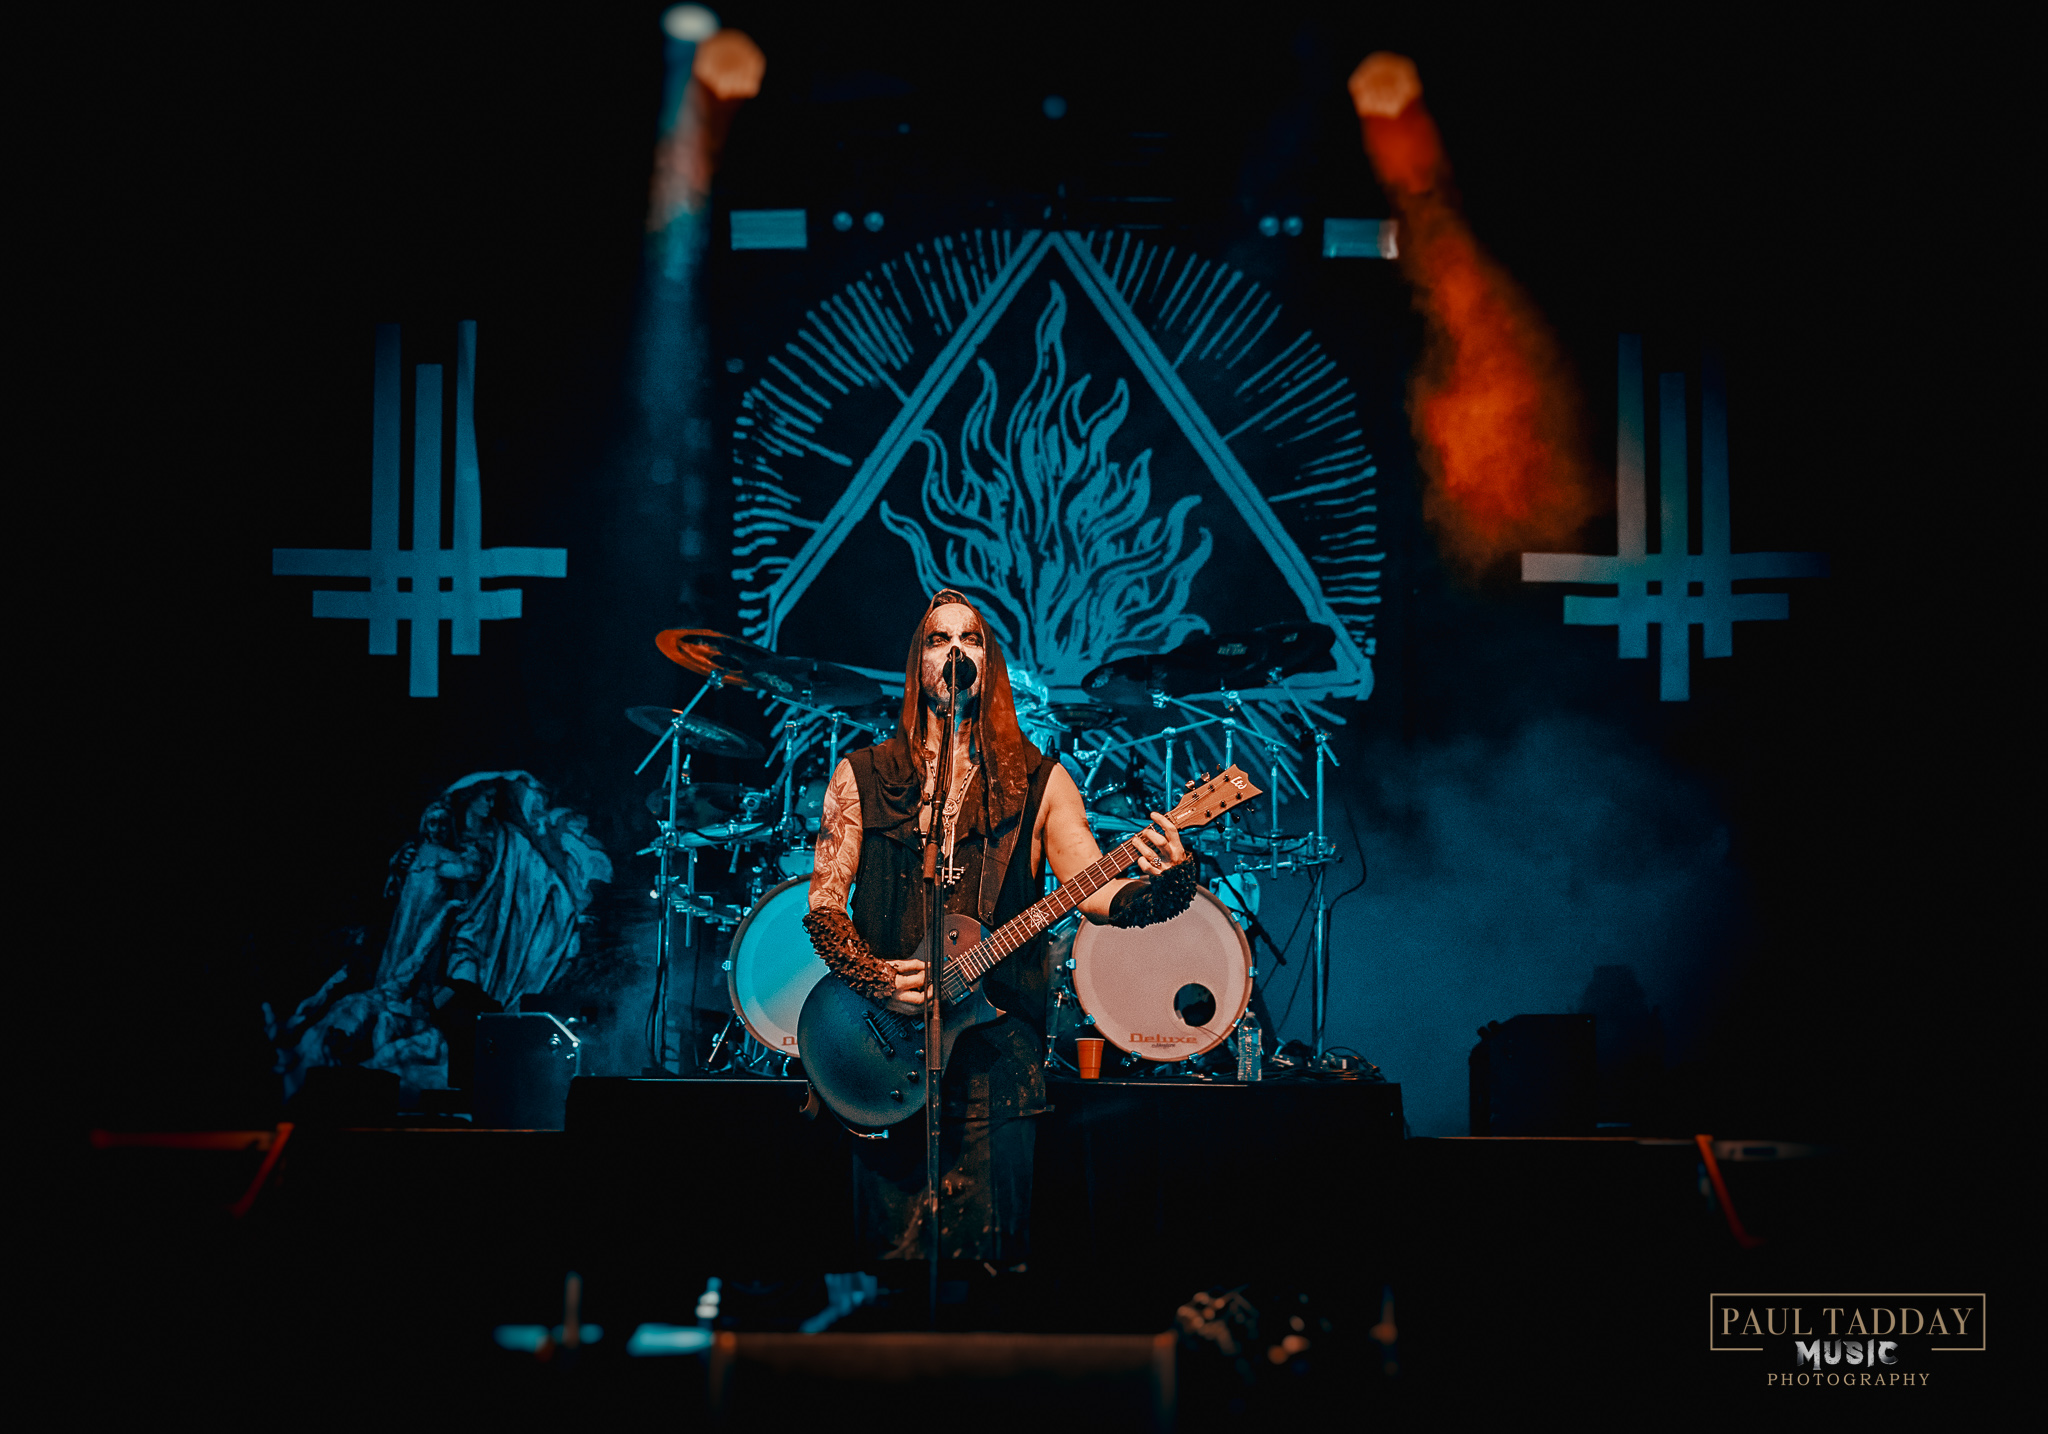 behemoth - brisbane - march 7 2019 - web - paul tadday photography - 36.jpg